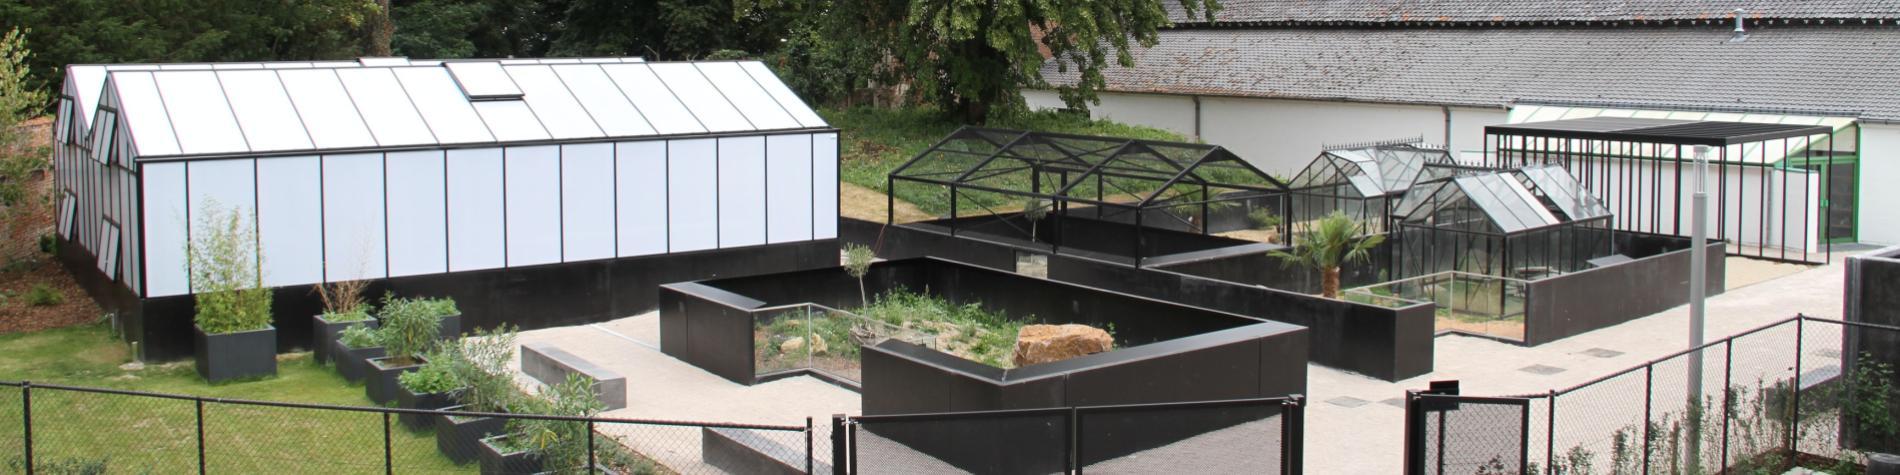 Musée d'Histoire naturelle -vivarium -Tournai -Jardin